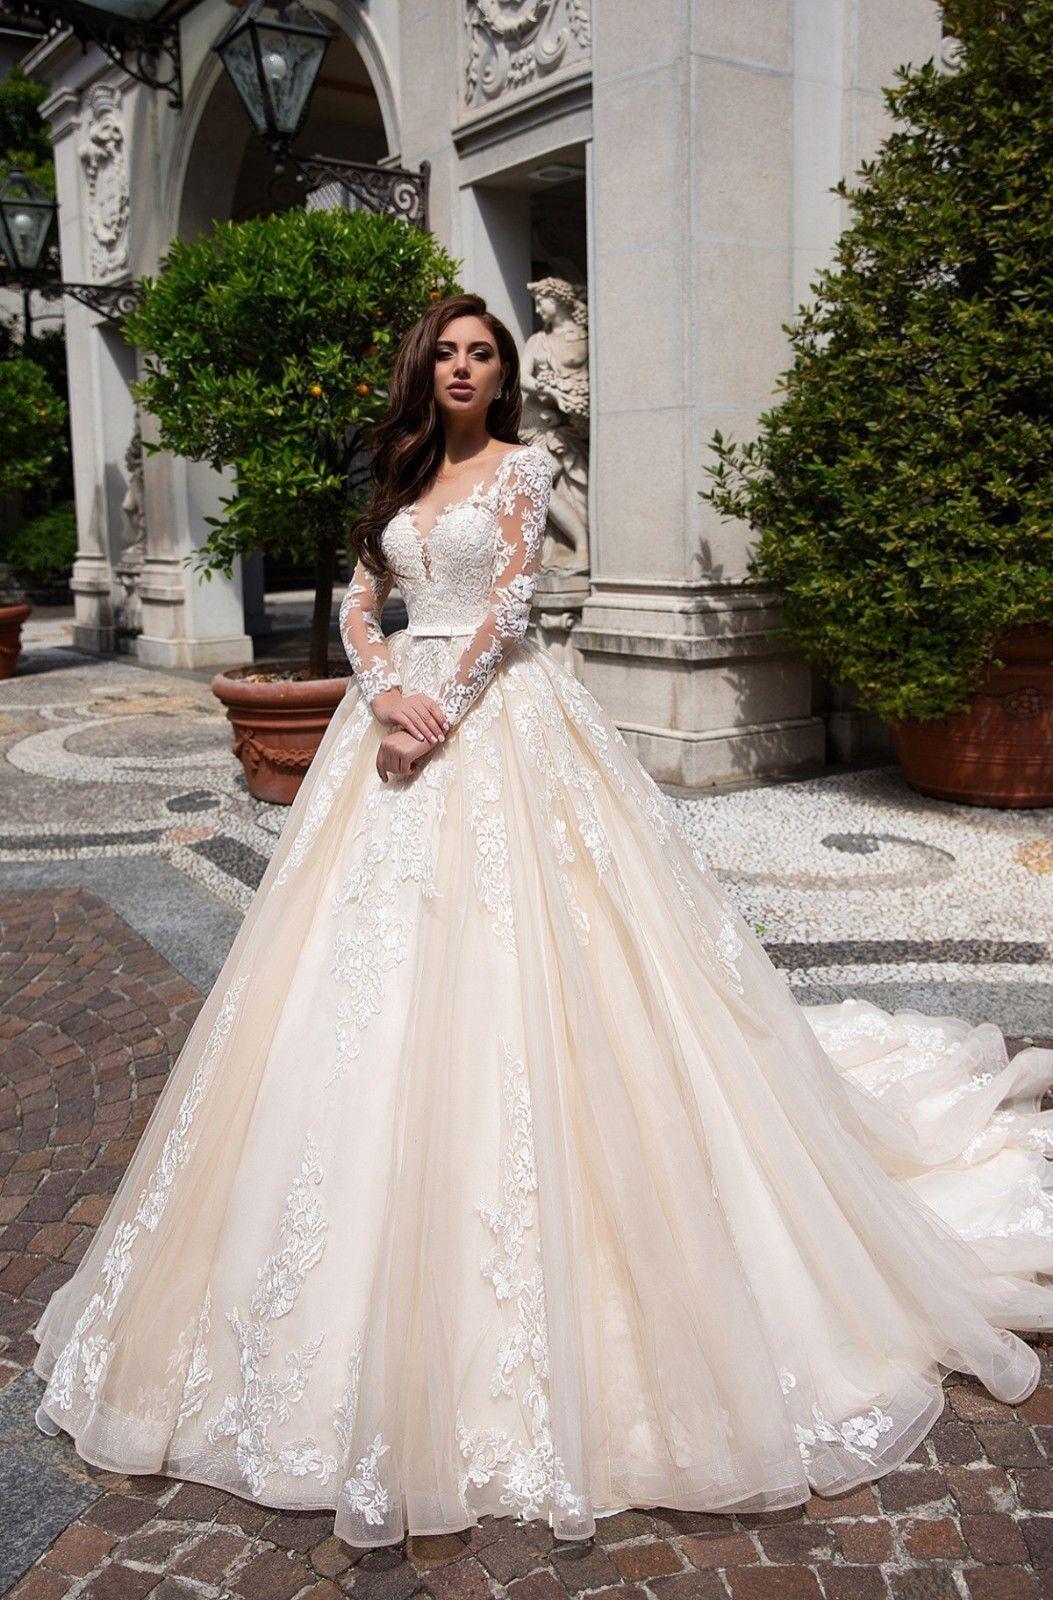 Lace Ball Gown Long Sleeve Wedding Dresses Ivory Wedding Dress Sleeves Ball Gown Wedding Dress Online Wedding Dress